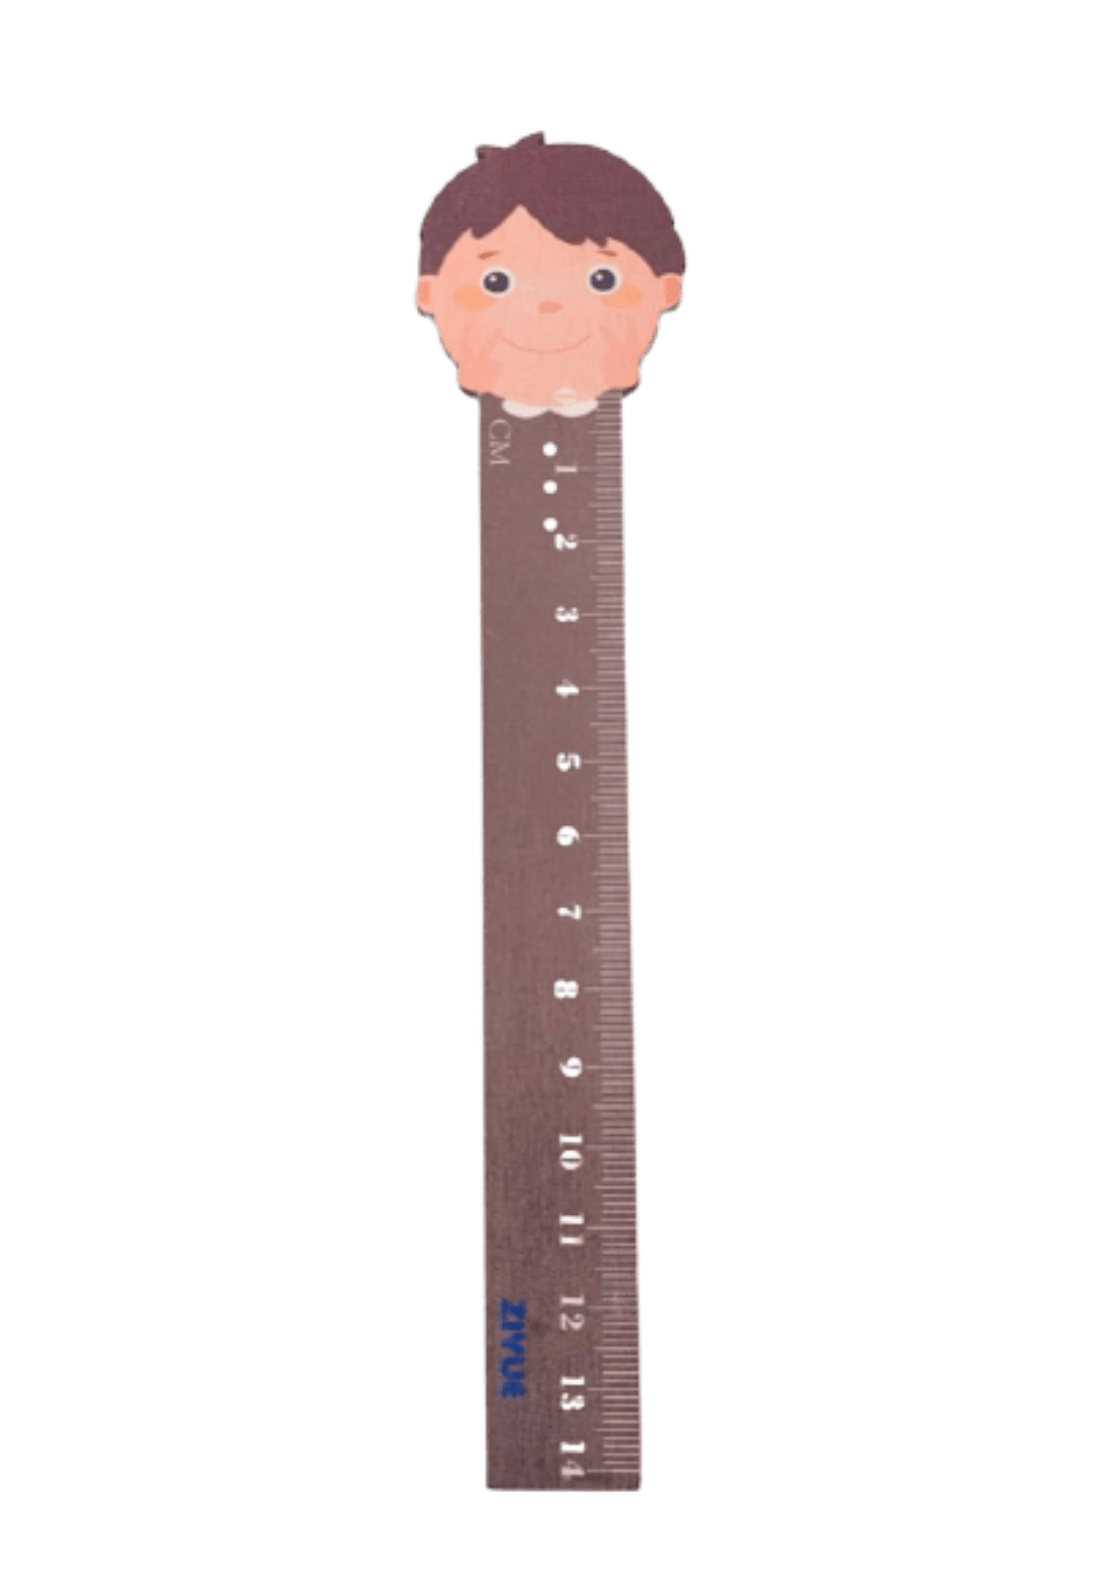 Wooden Ruler مسطرة خشبية